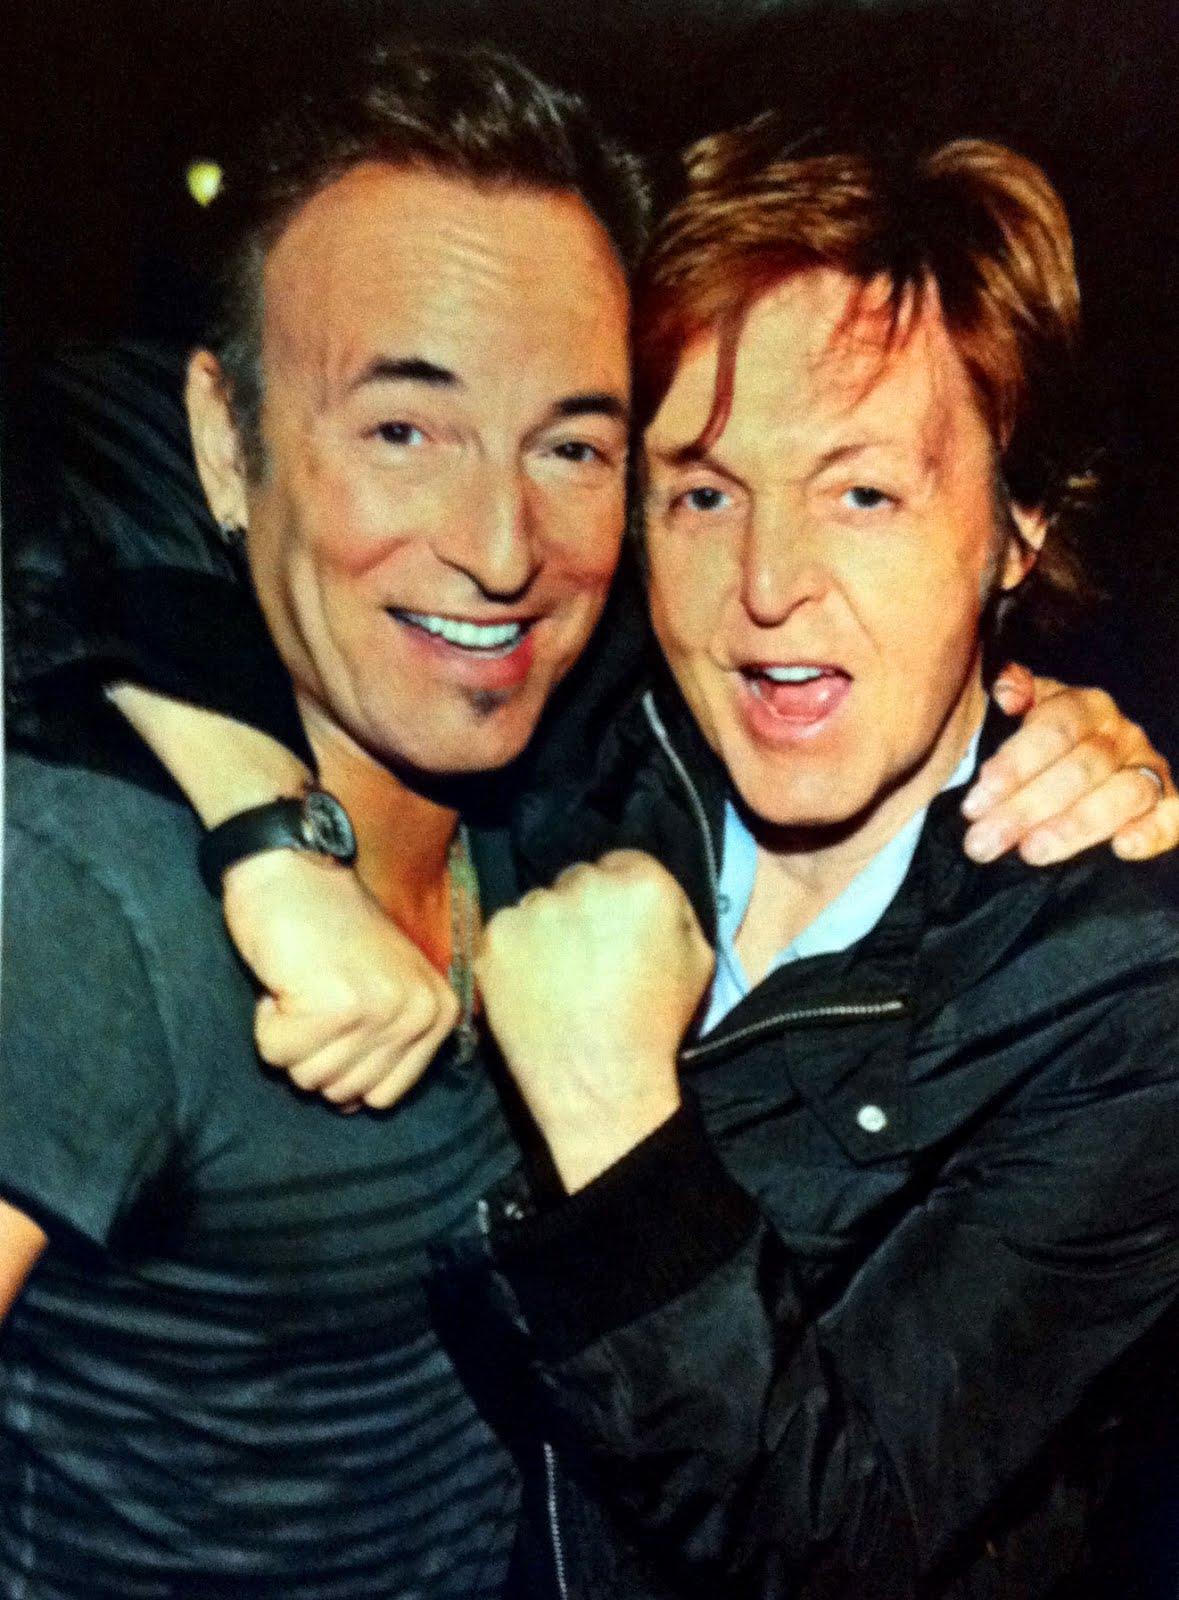 Bruce Springsteen Paul Mccartney : 1000 images about music mad musicians male on pinterest george michael bruce springsteen ~ Vivirlamusica.com Haus und Dekorationen